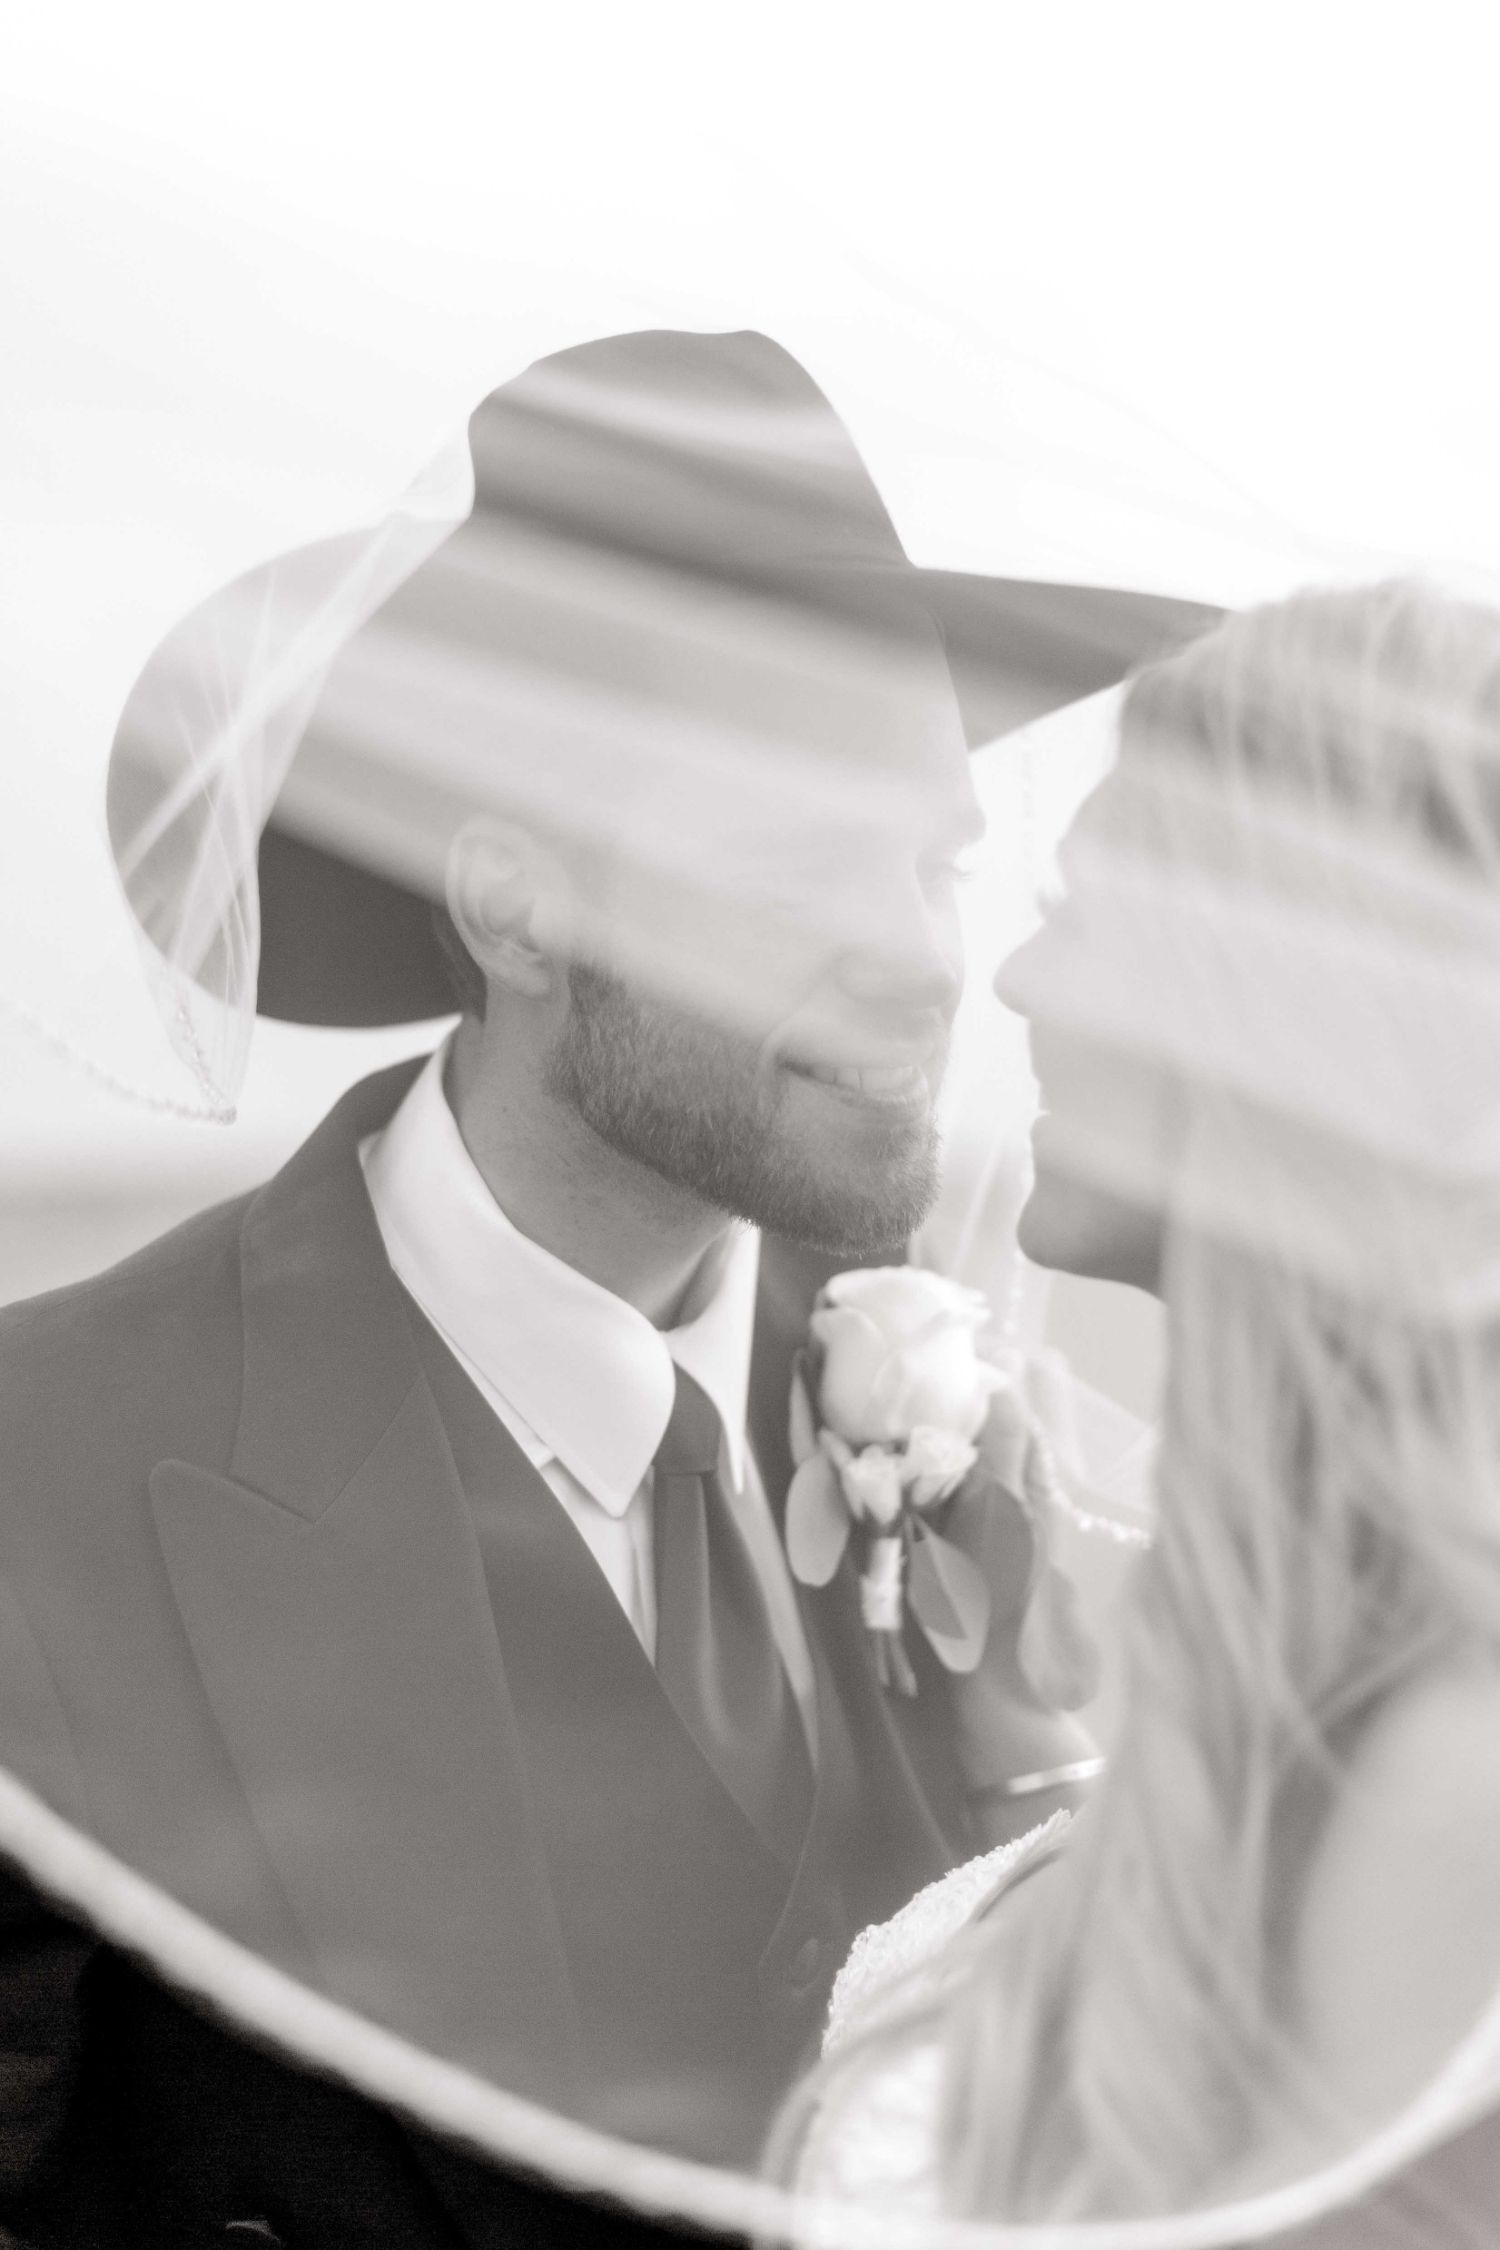 wichita-falls-wedding-katelyn-colten-vernon-texas-39.jpg